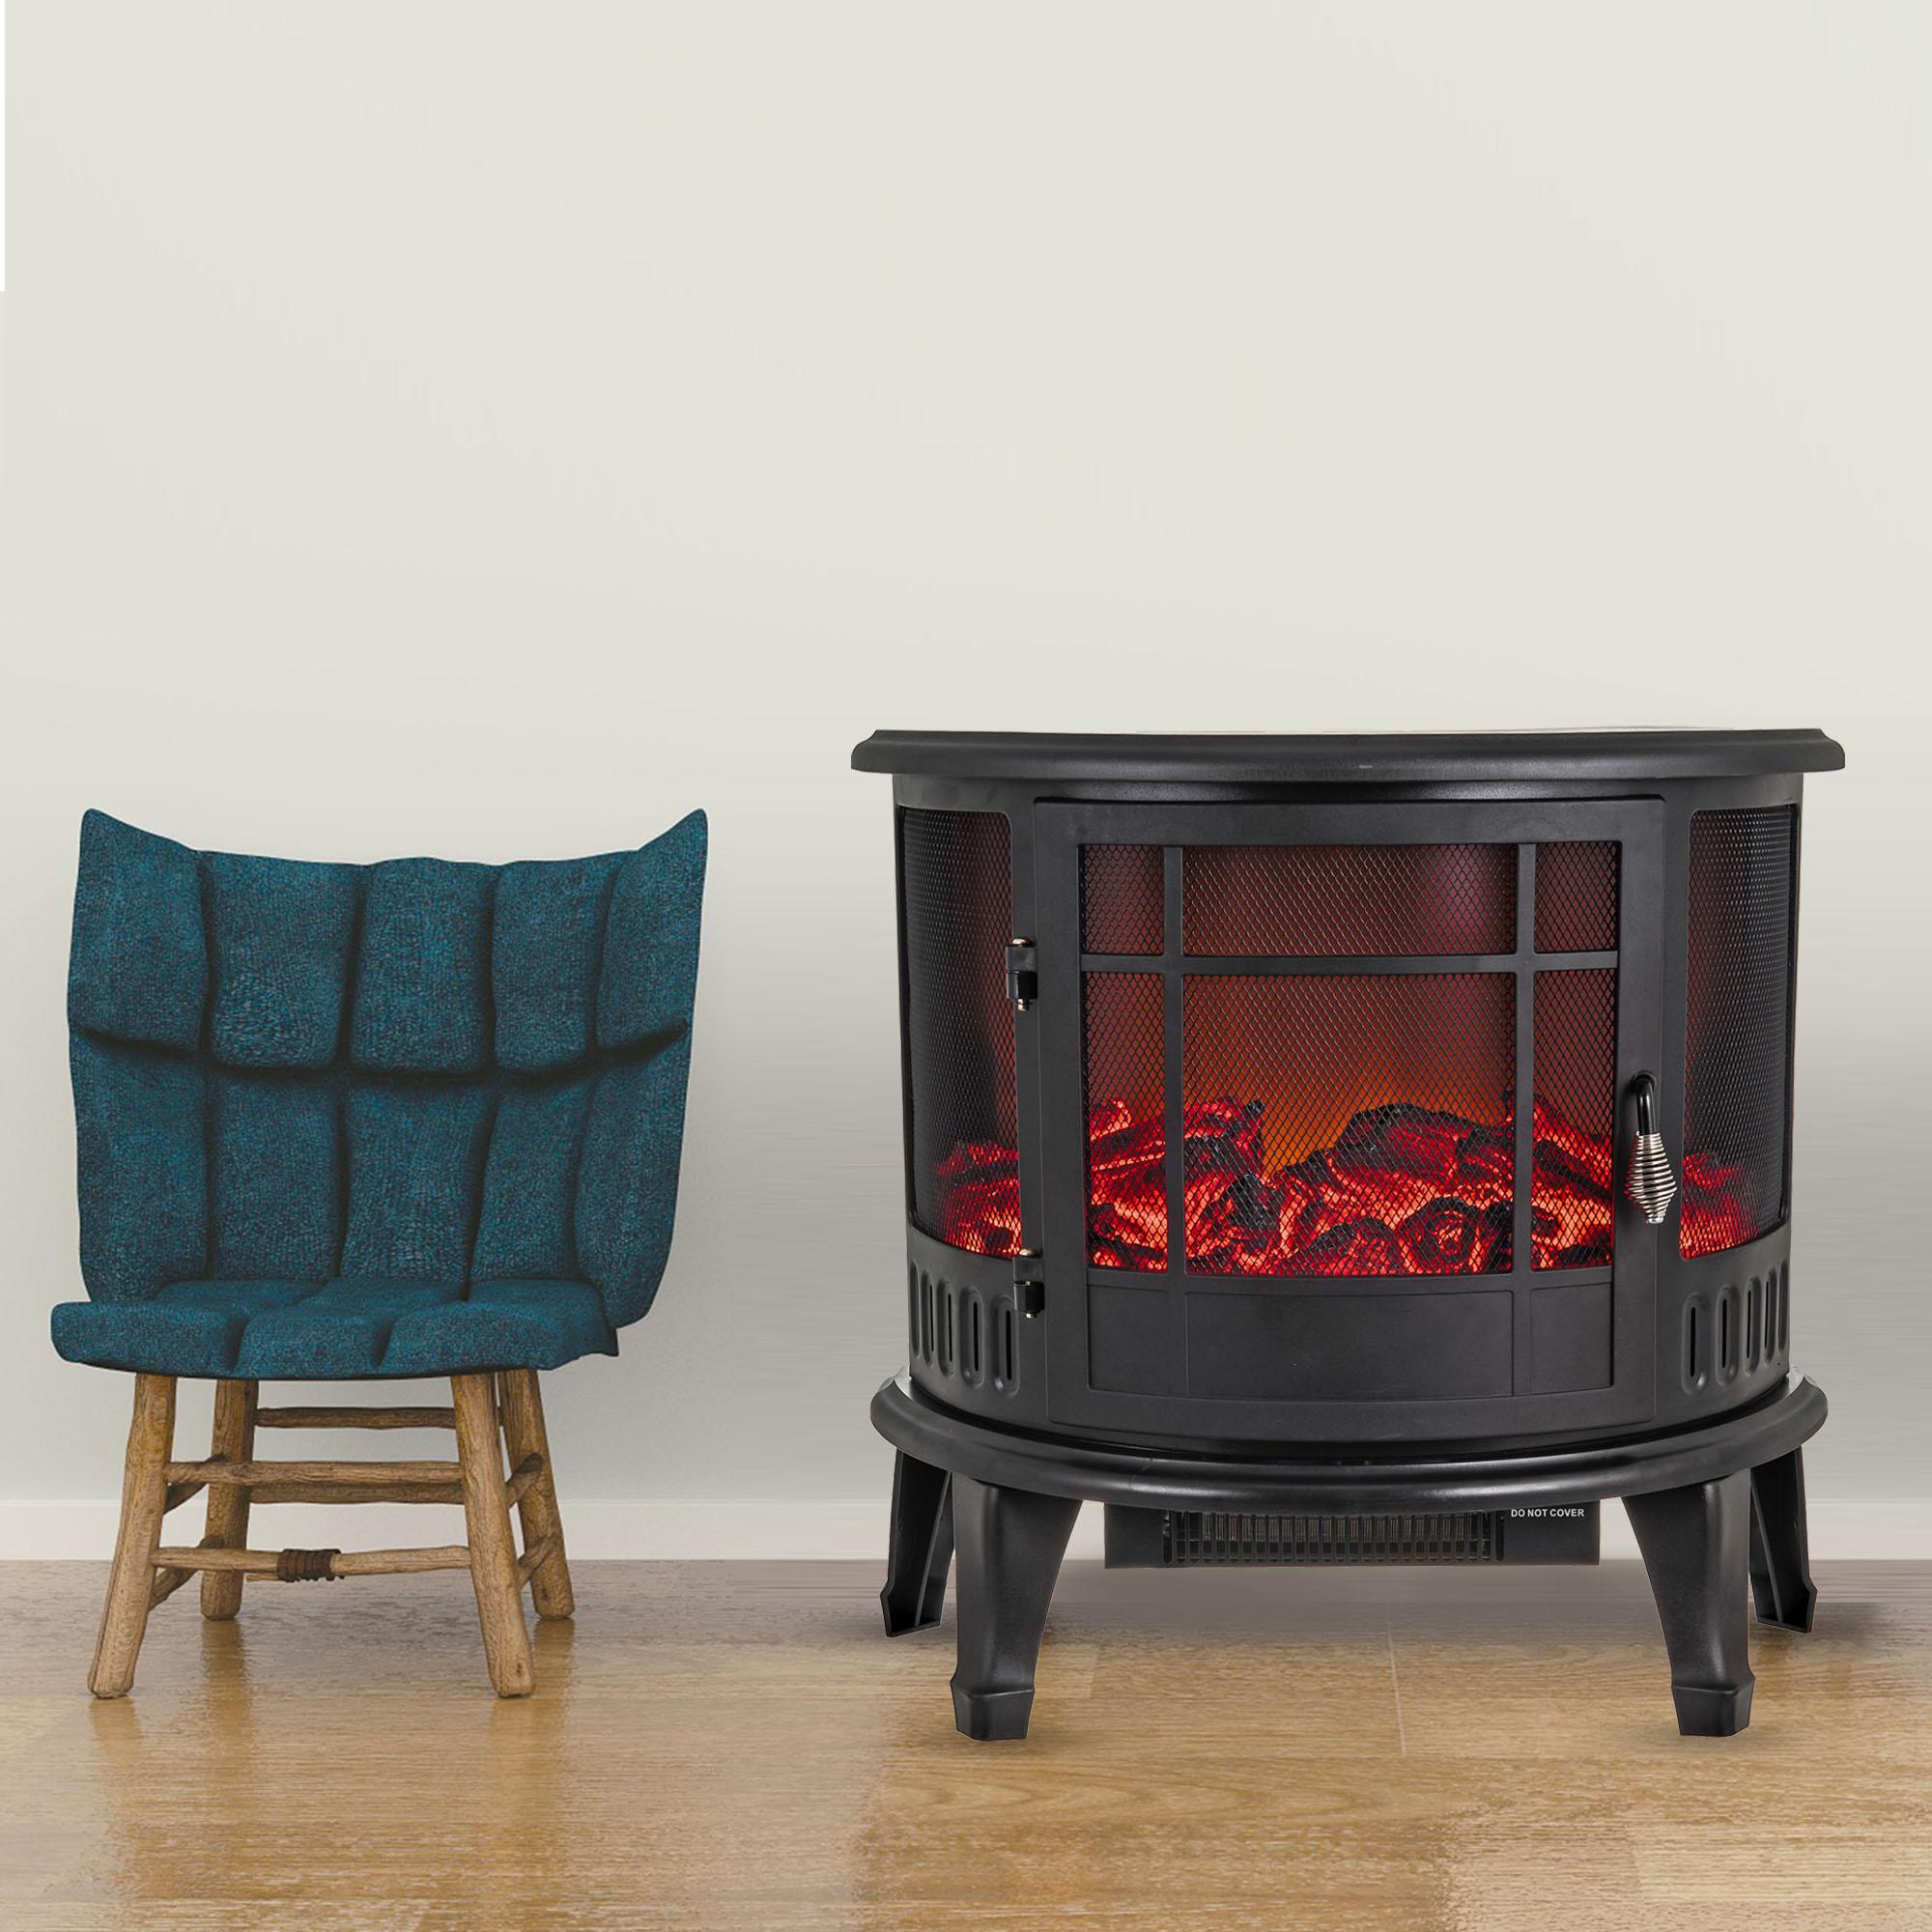 1800W Electric Flame Log Burning Effect